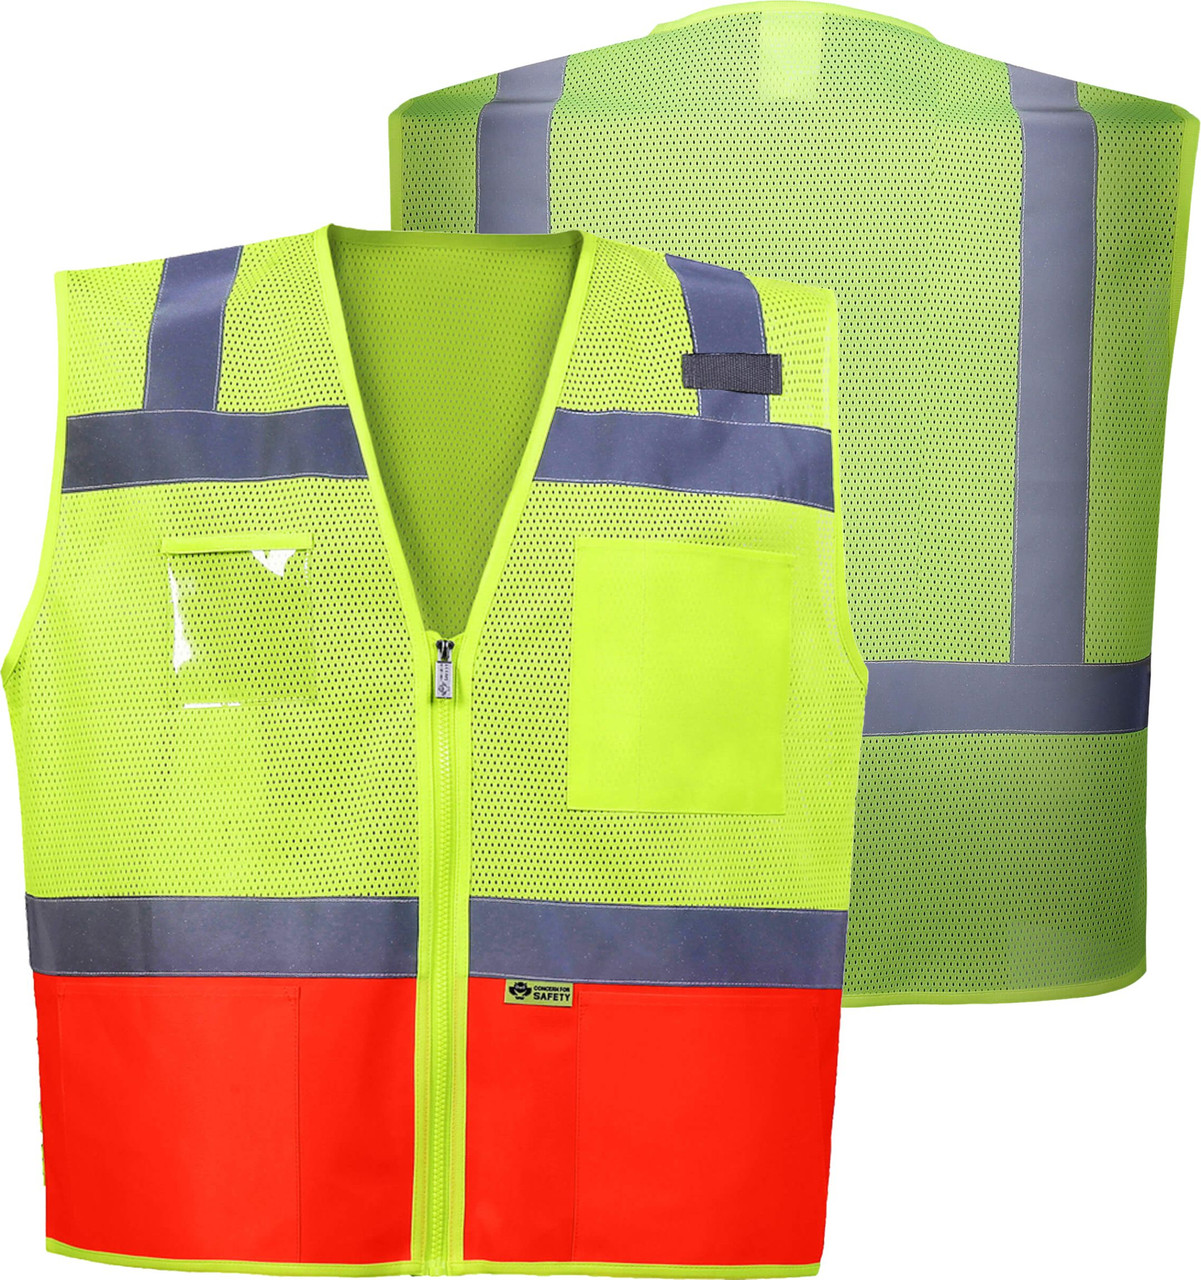 Orange Bottom Class 2 Safety Vest | ANSI Class 2 Two Tone Contrast Safety Vest | Safety Green and Safety Orange Zipper front Safety Vest | Lime/Orange Reflective Vest